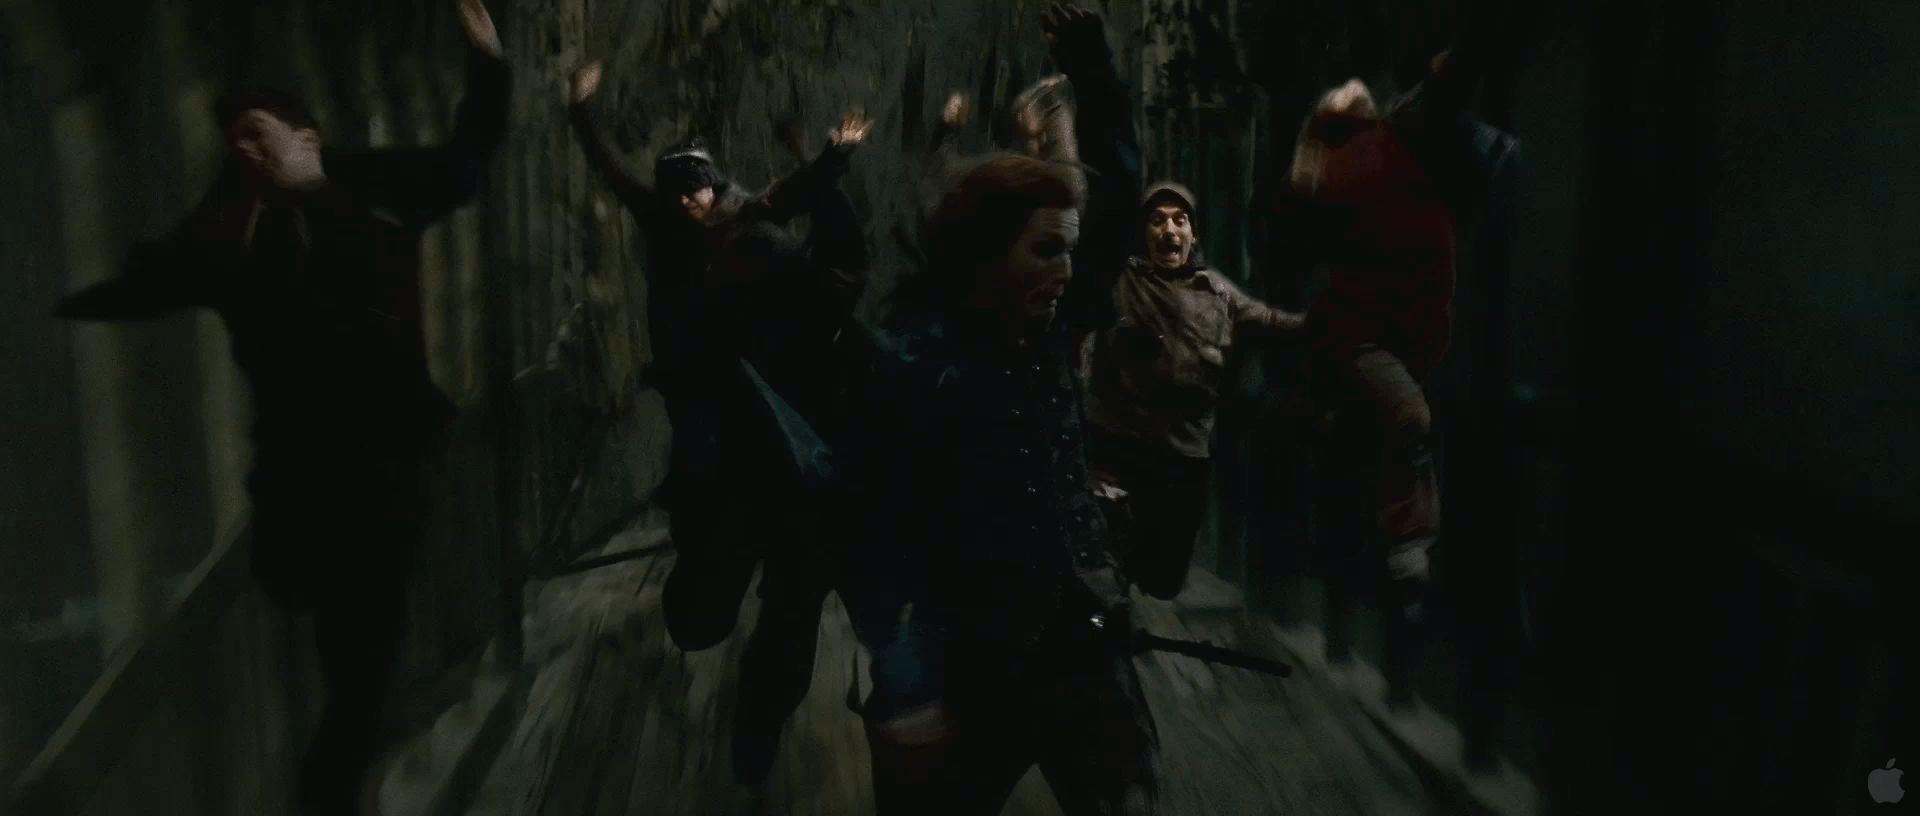 Harry Potter BlogHogwarts HP7 2 Trailer 73